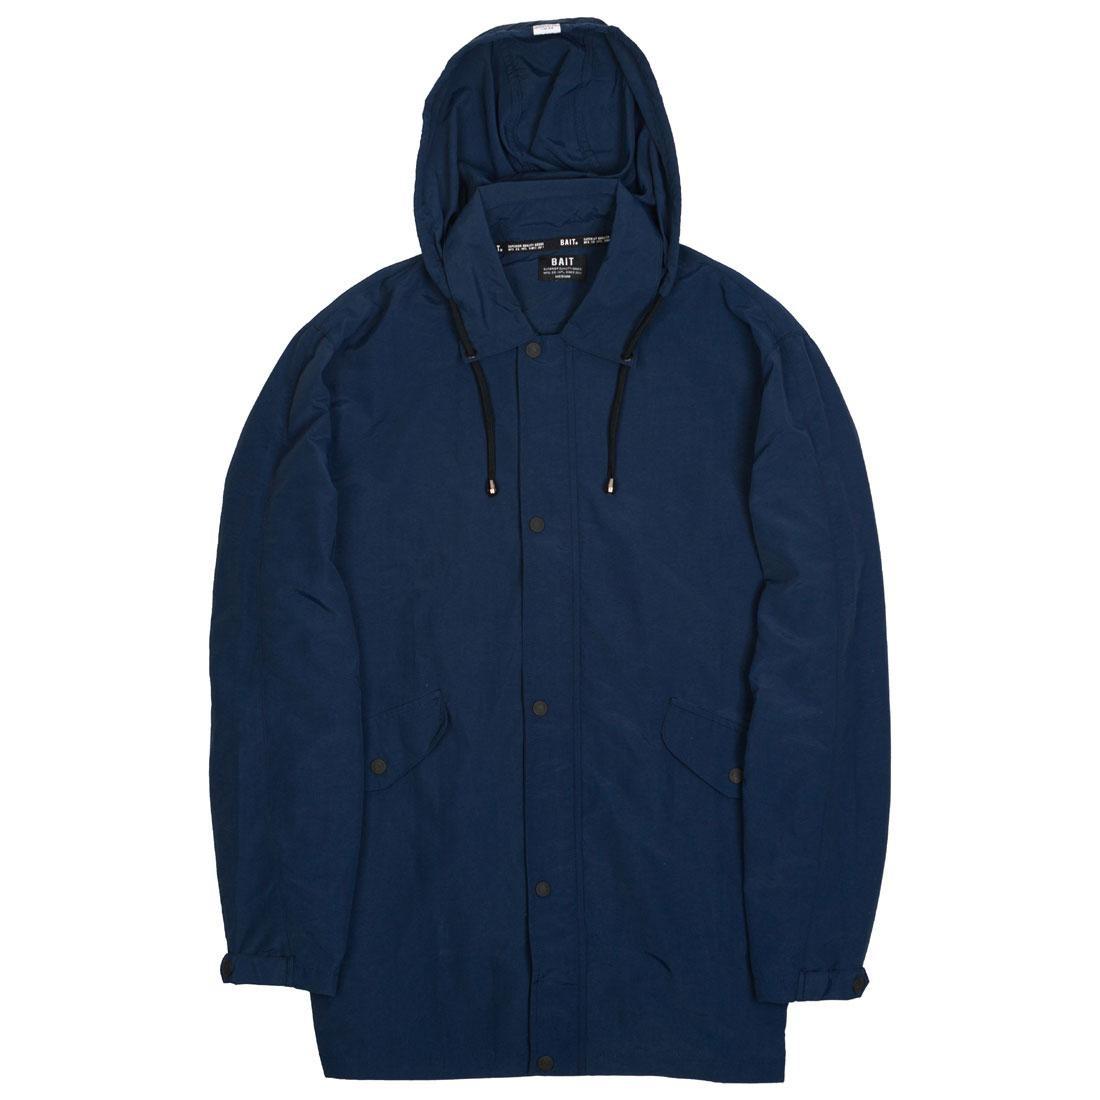 BAIT Men Nylon Windbreaker Jacket (navy / blue)